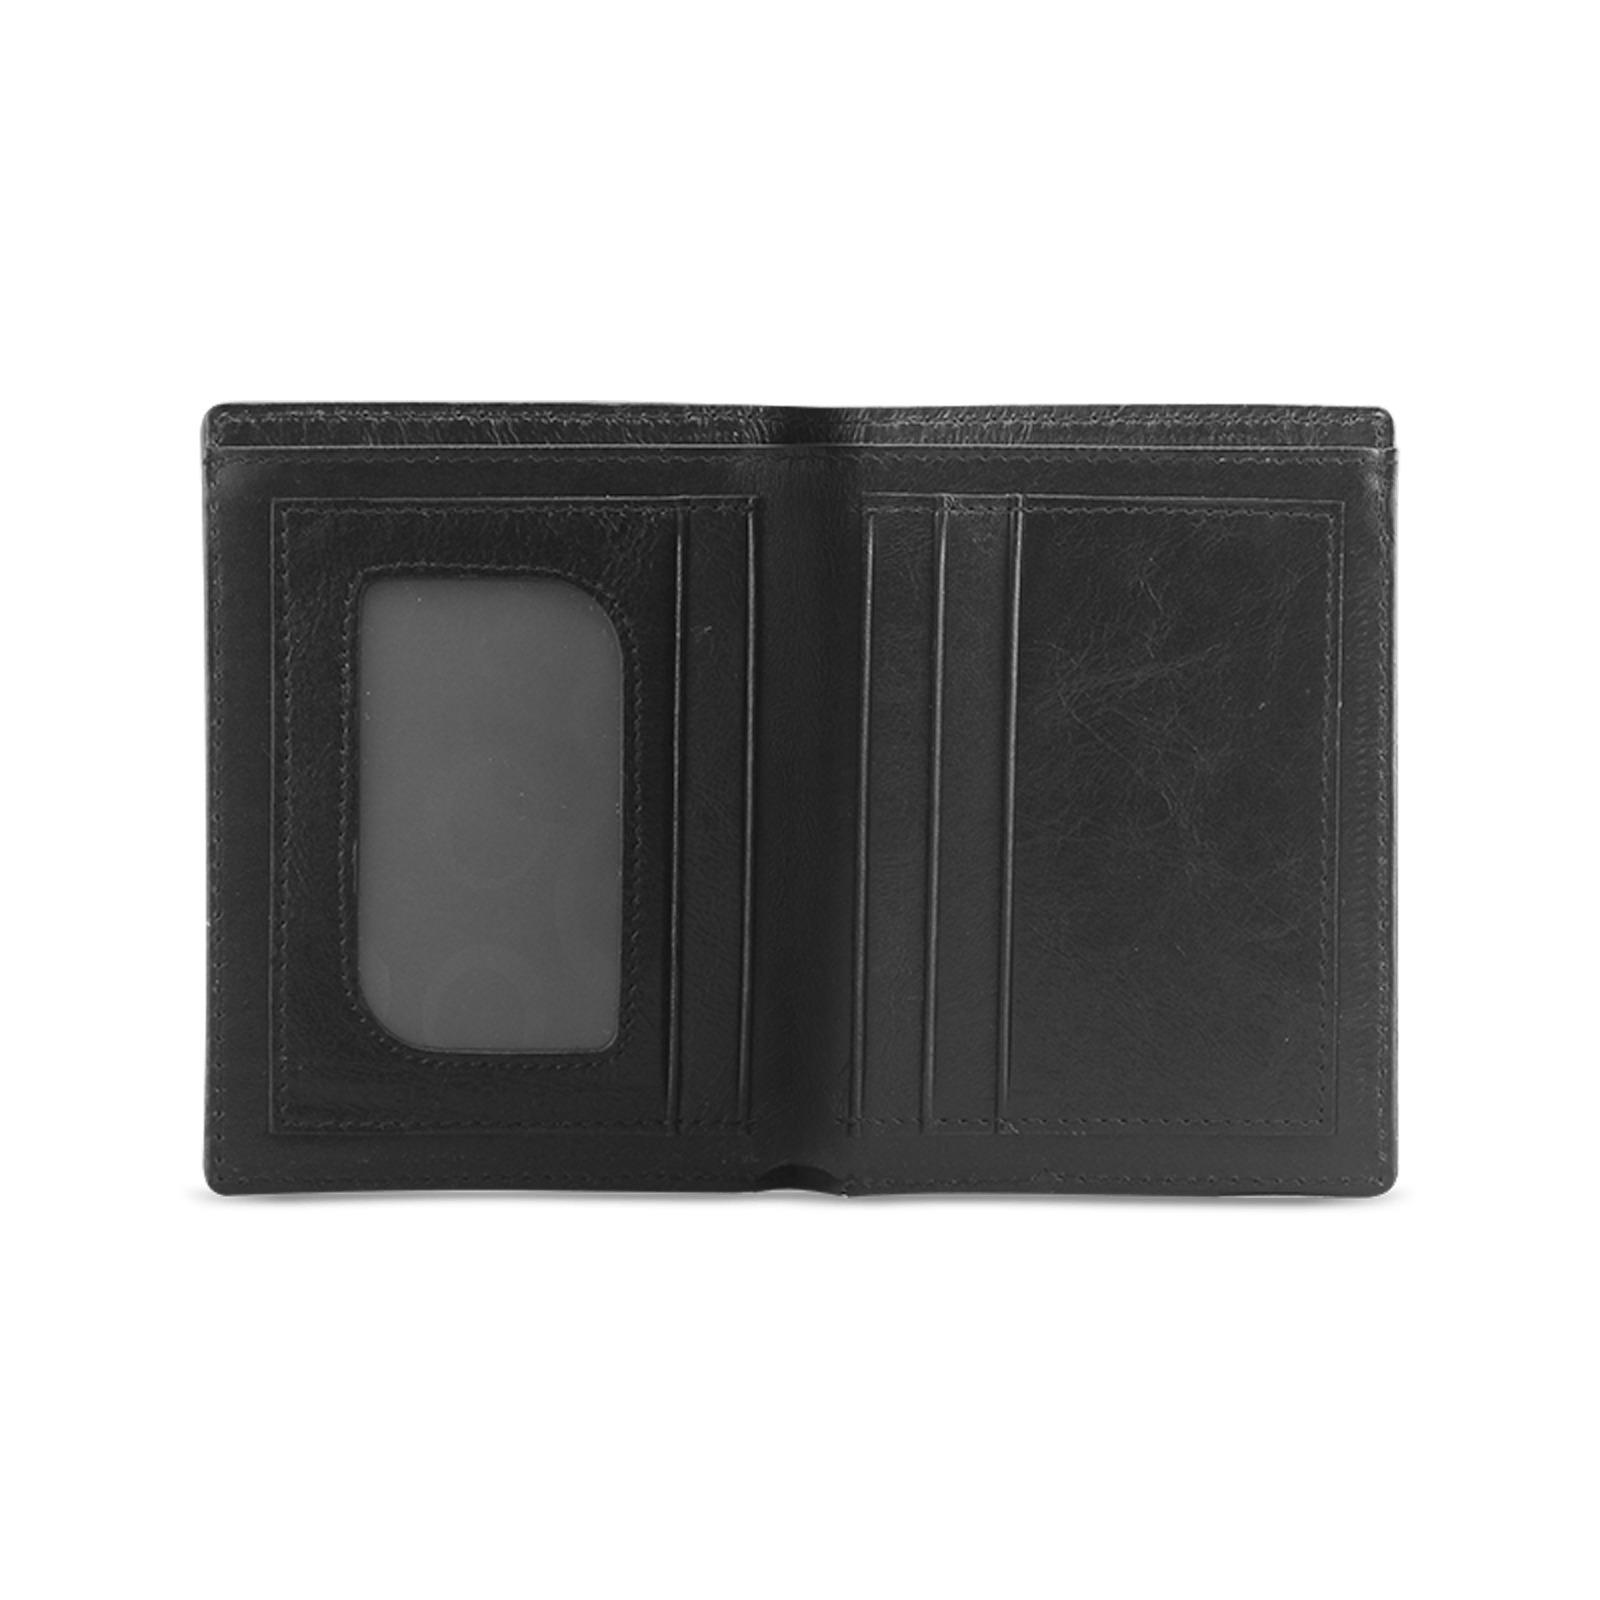 DOLLARS WALLET Men's Leather Wallet (Model 1612)